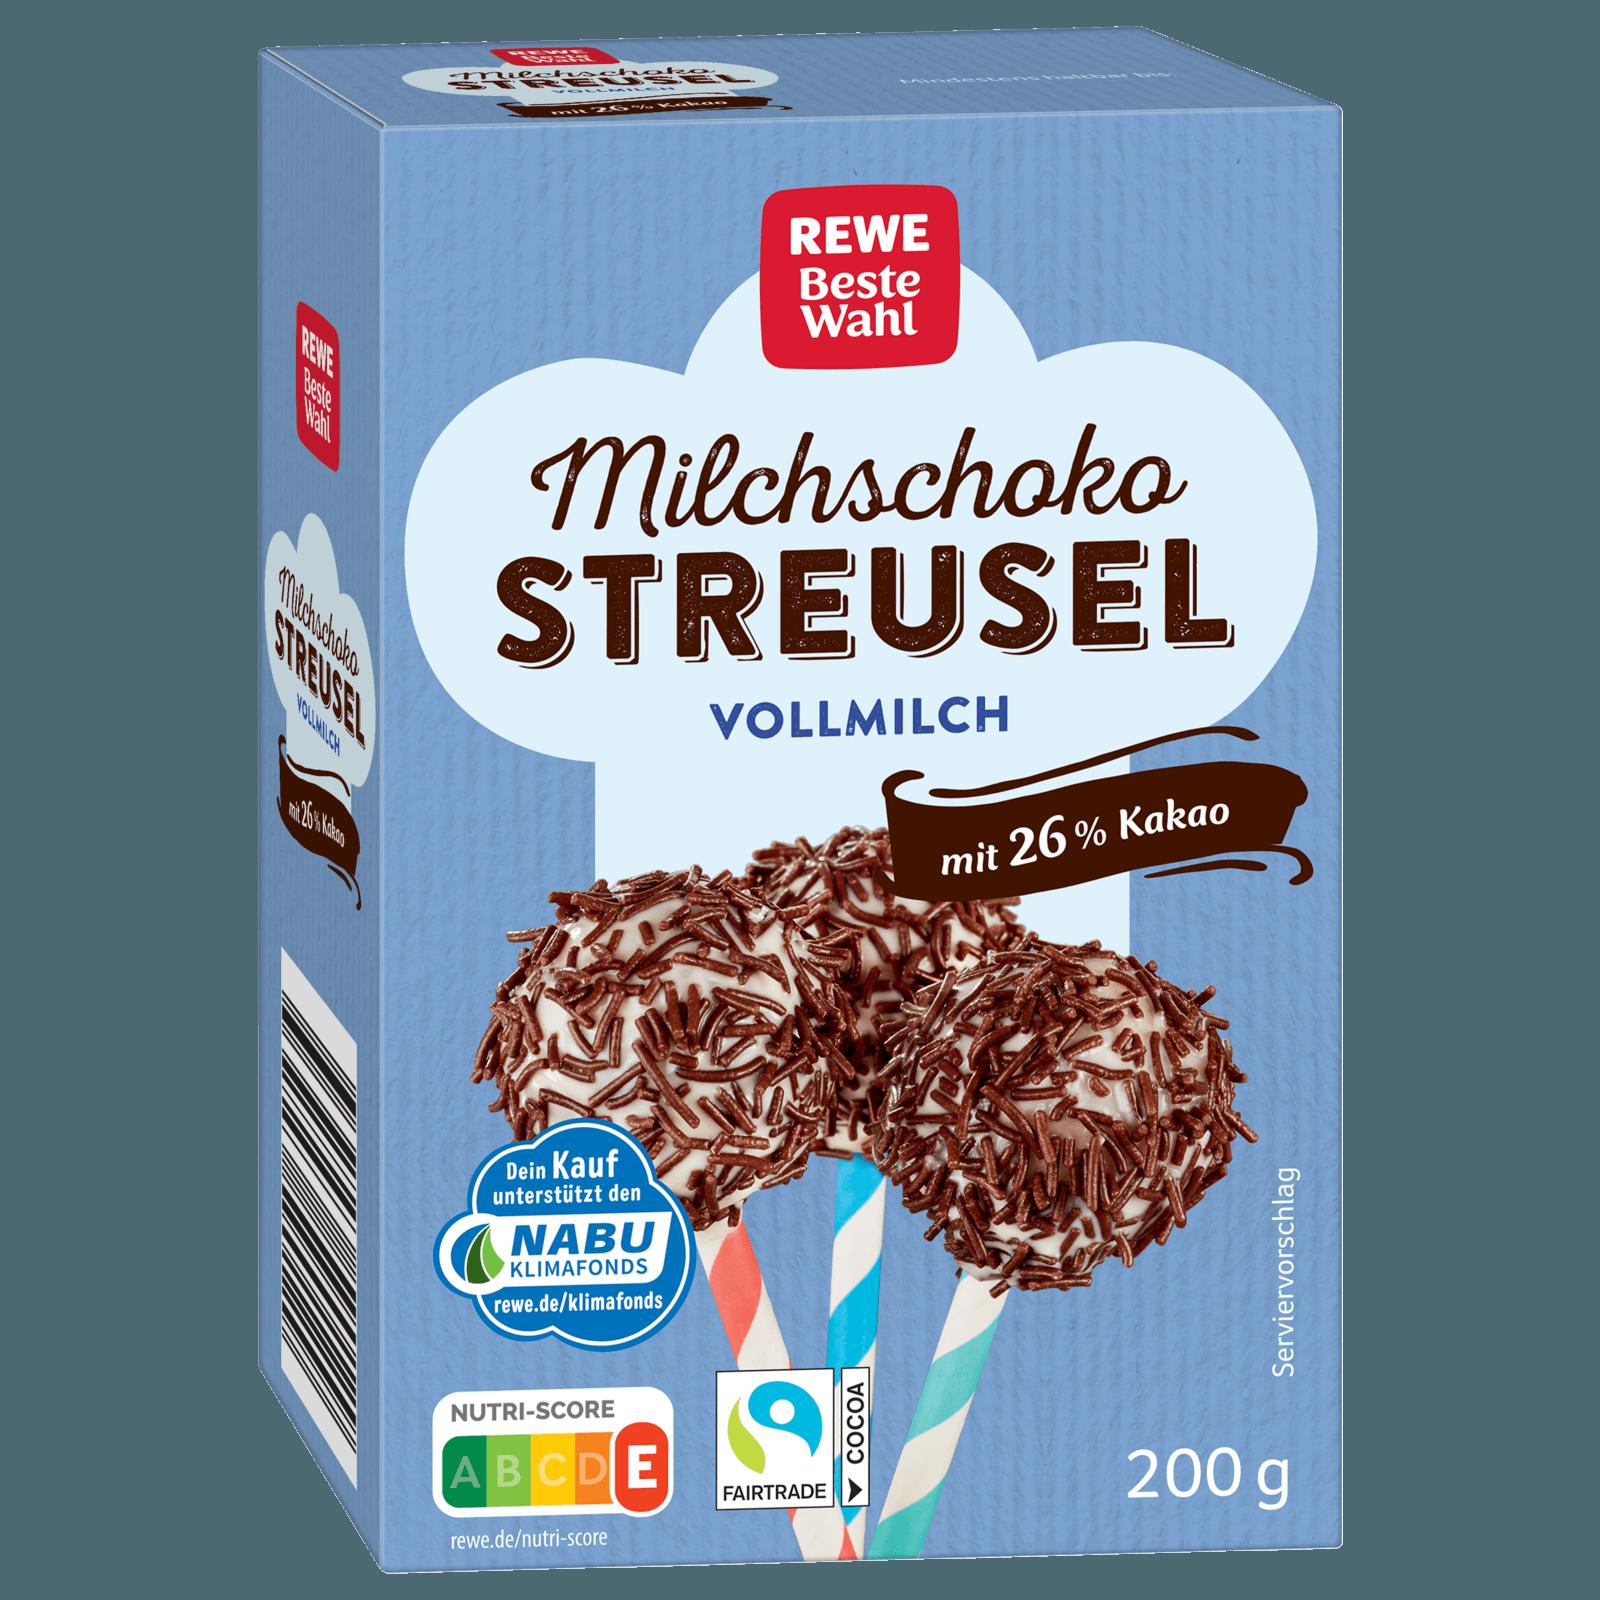 REWE Beste Wahl Milchschoko-Streusel 200g